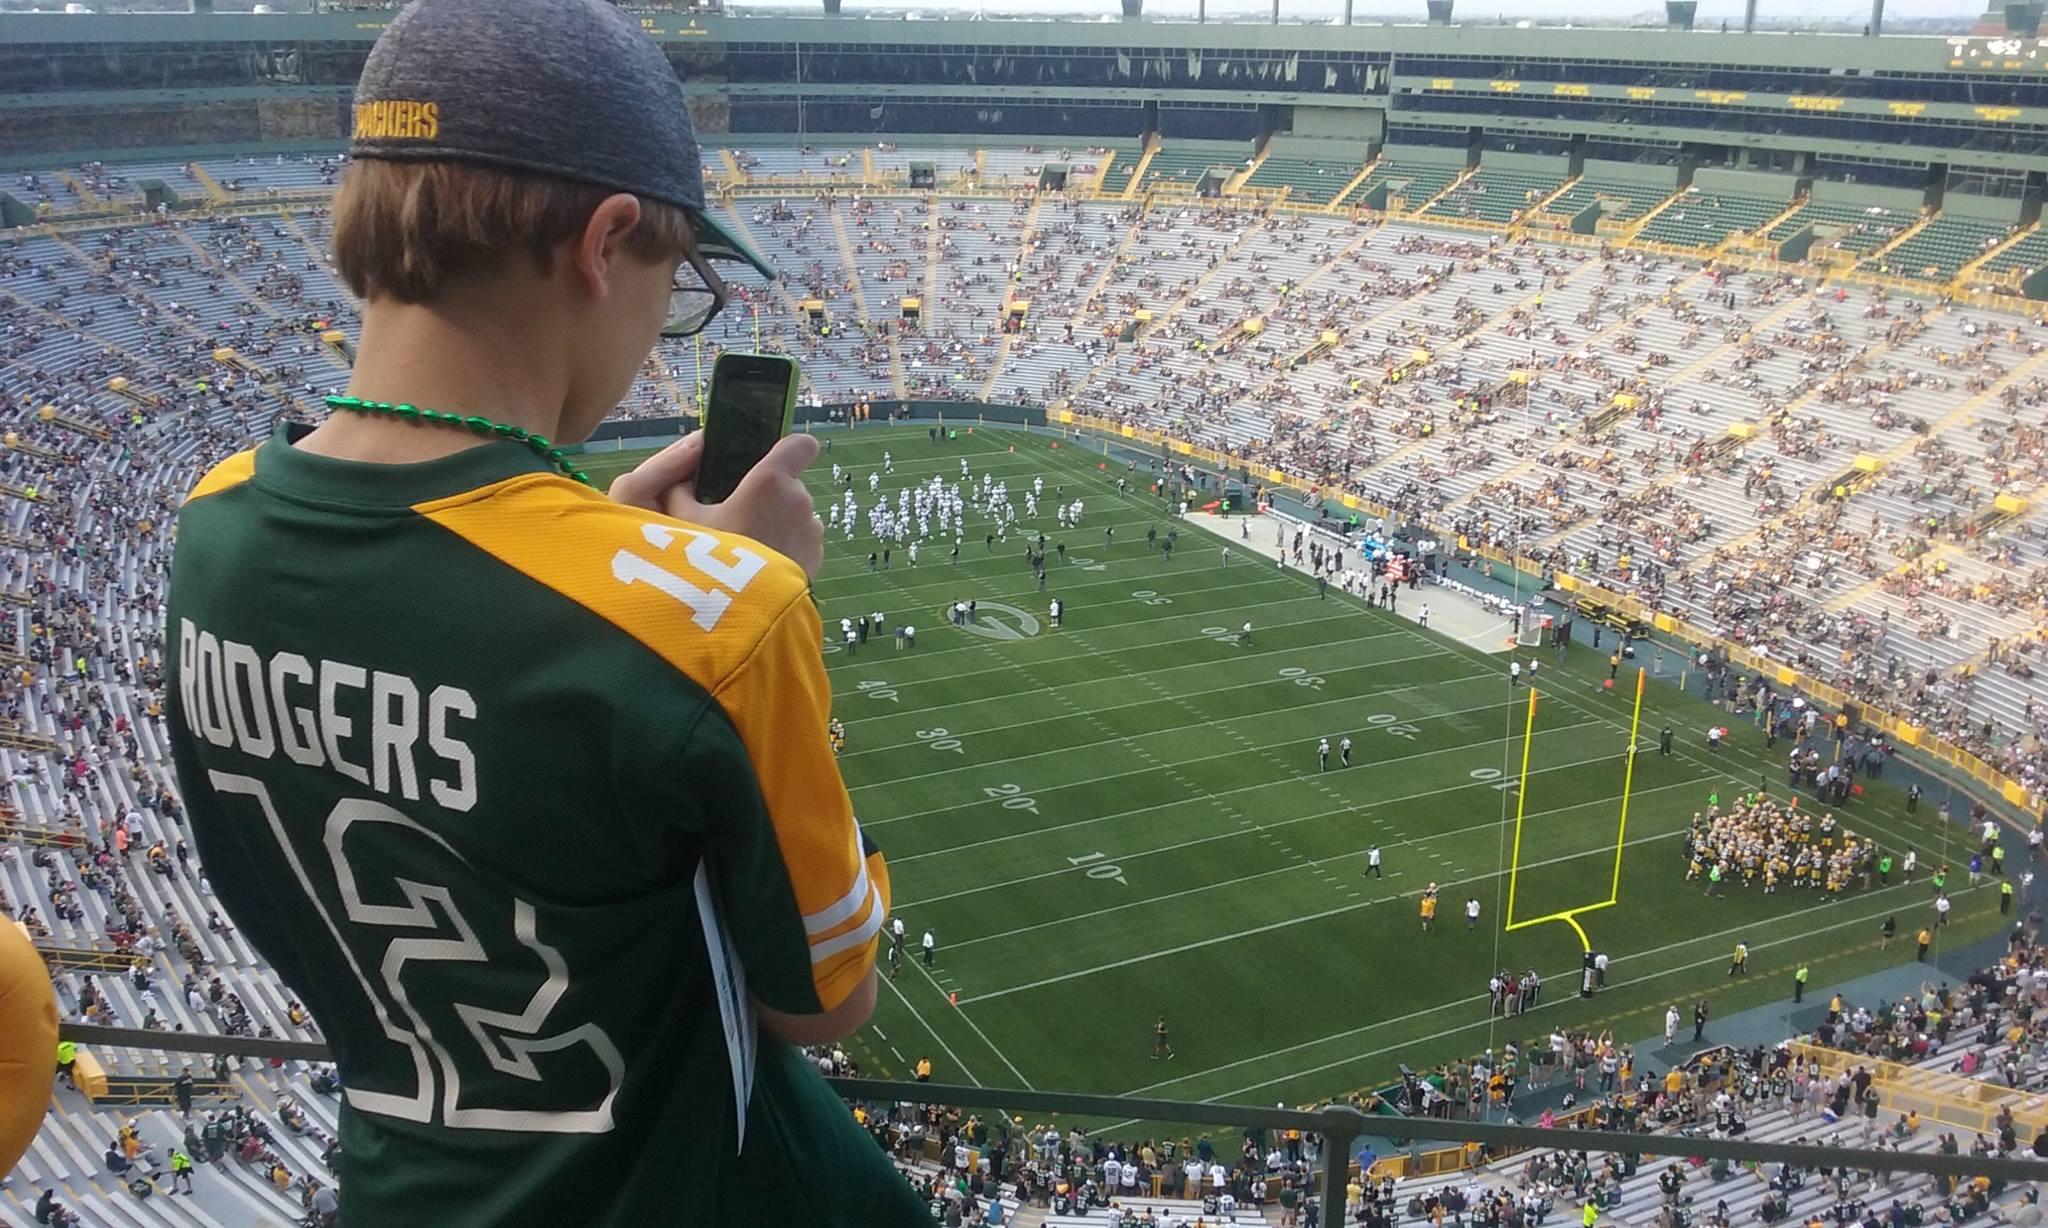 File photo. Green Bay Packers at Lambeau Field, Ashwaubenon, Wisconsin.